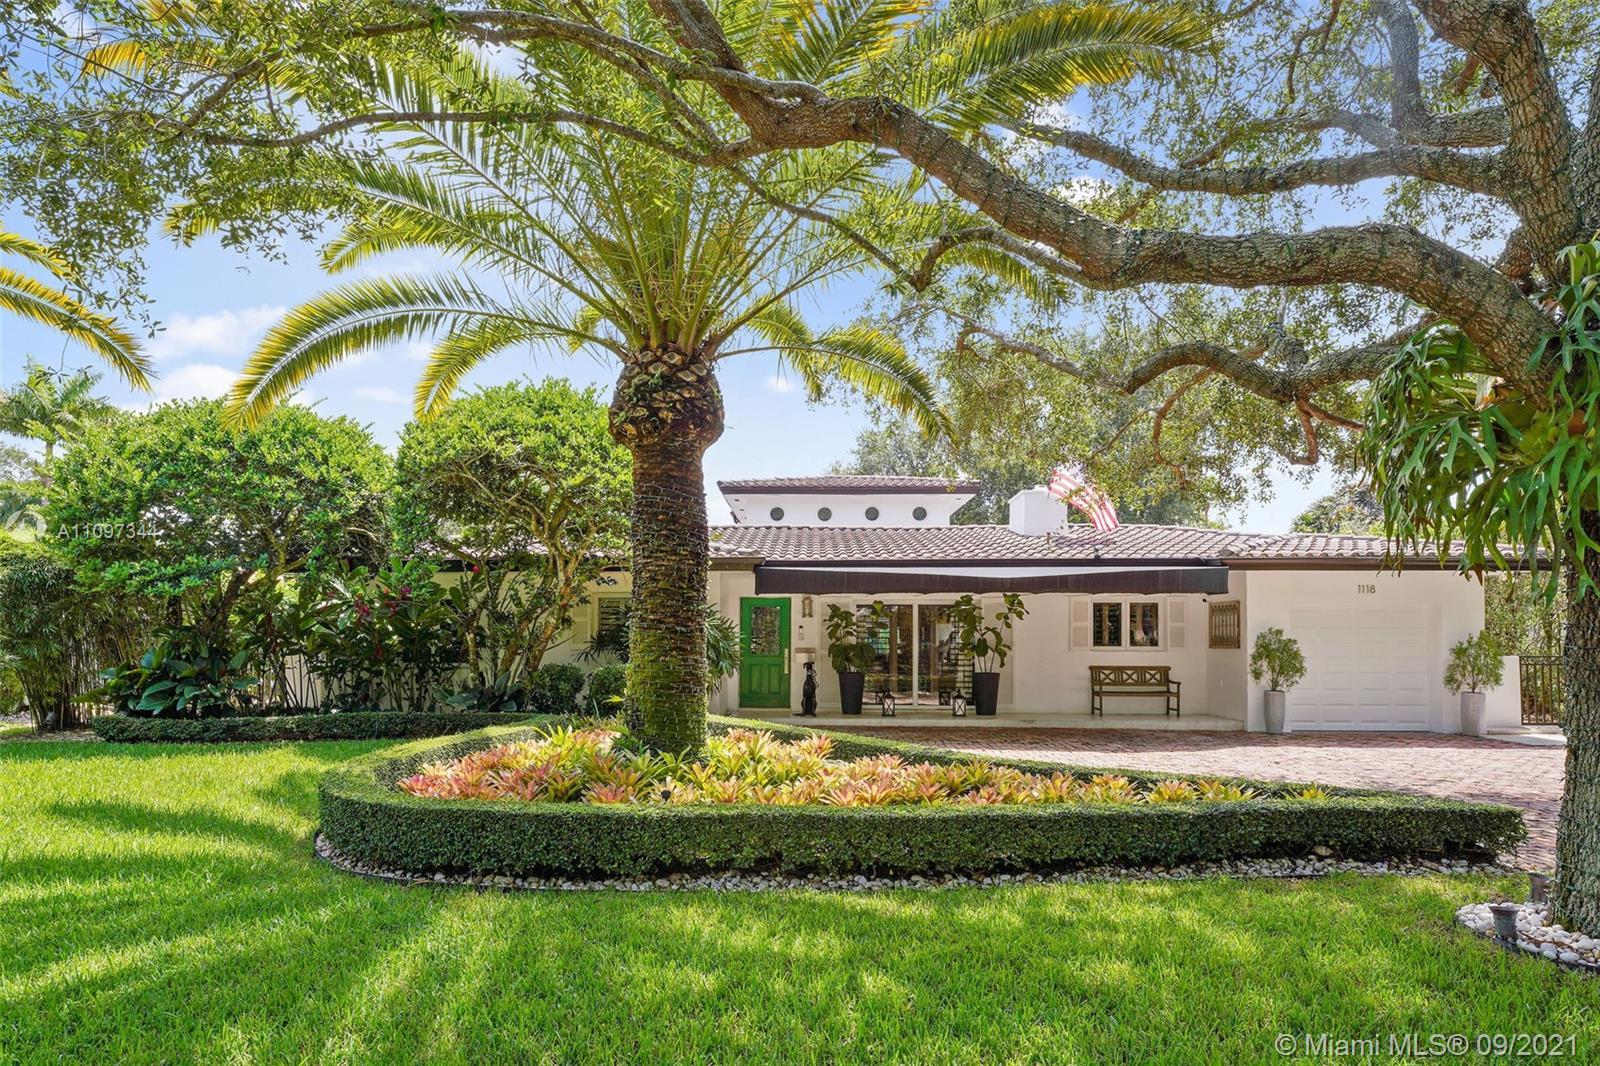 Single Family Home,For Sale,1118 Placetas Ave, Coral Gables, Florida 33146,Brickell,realty,broker,condos near me